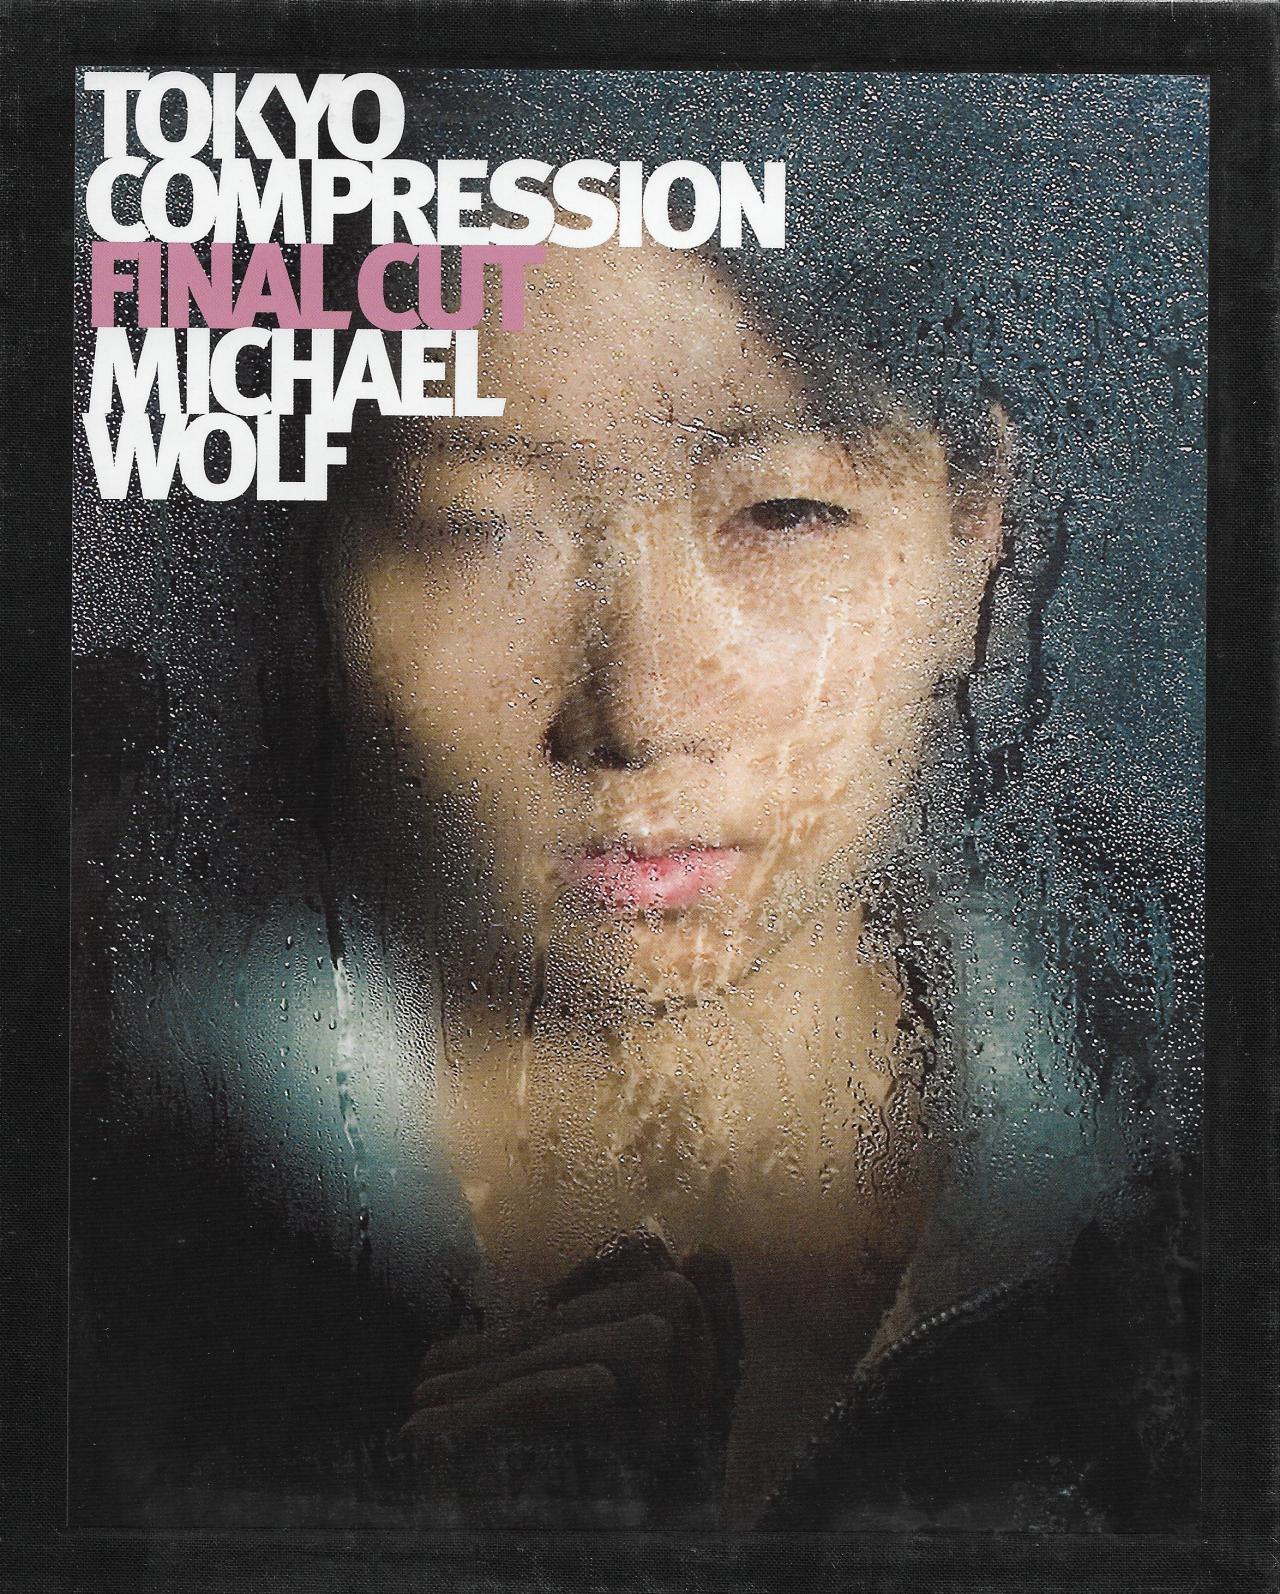 Michael Wolf: Tokyo Compression – Final Cut